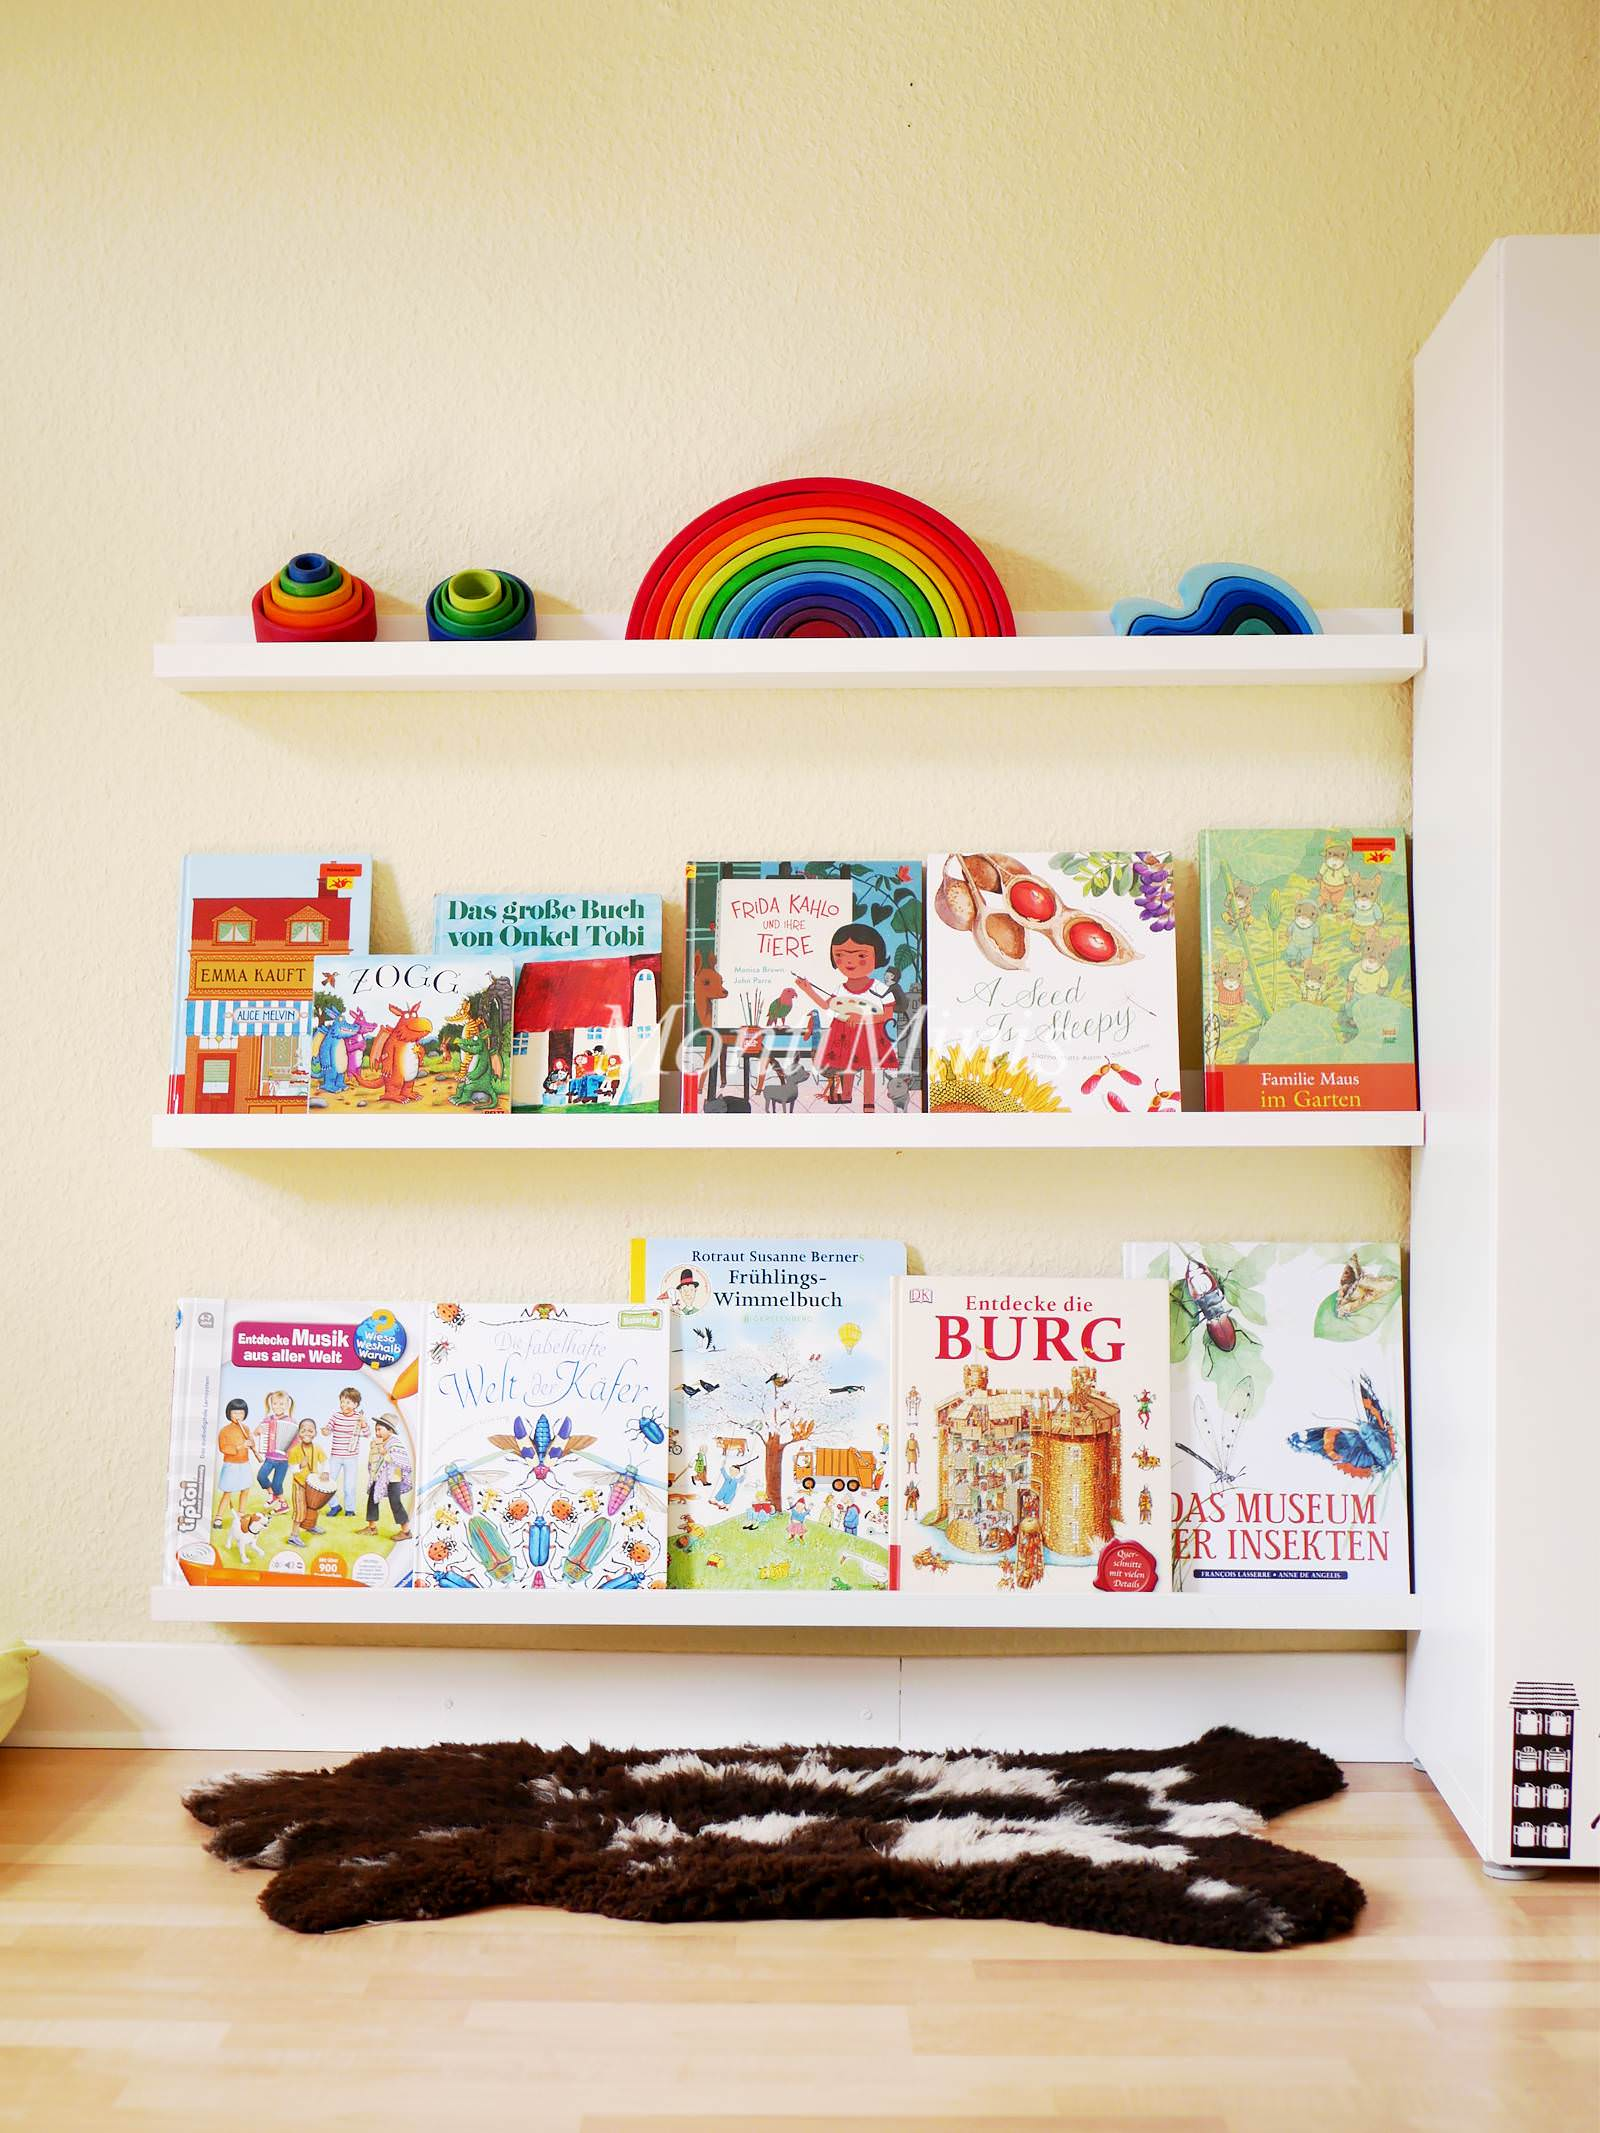 Full Size of Bücherregal Kinderzimmer Michels Mit 2 Regal Weiß Sofa Regale Kinderzimmer Bücherregal Kinderzimmer